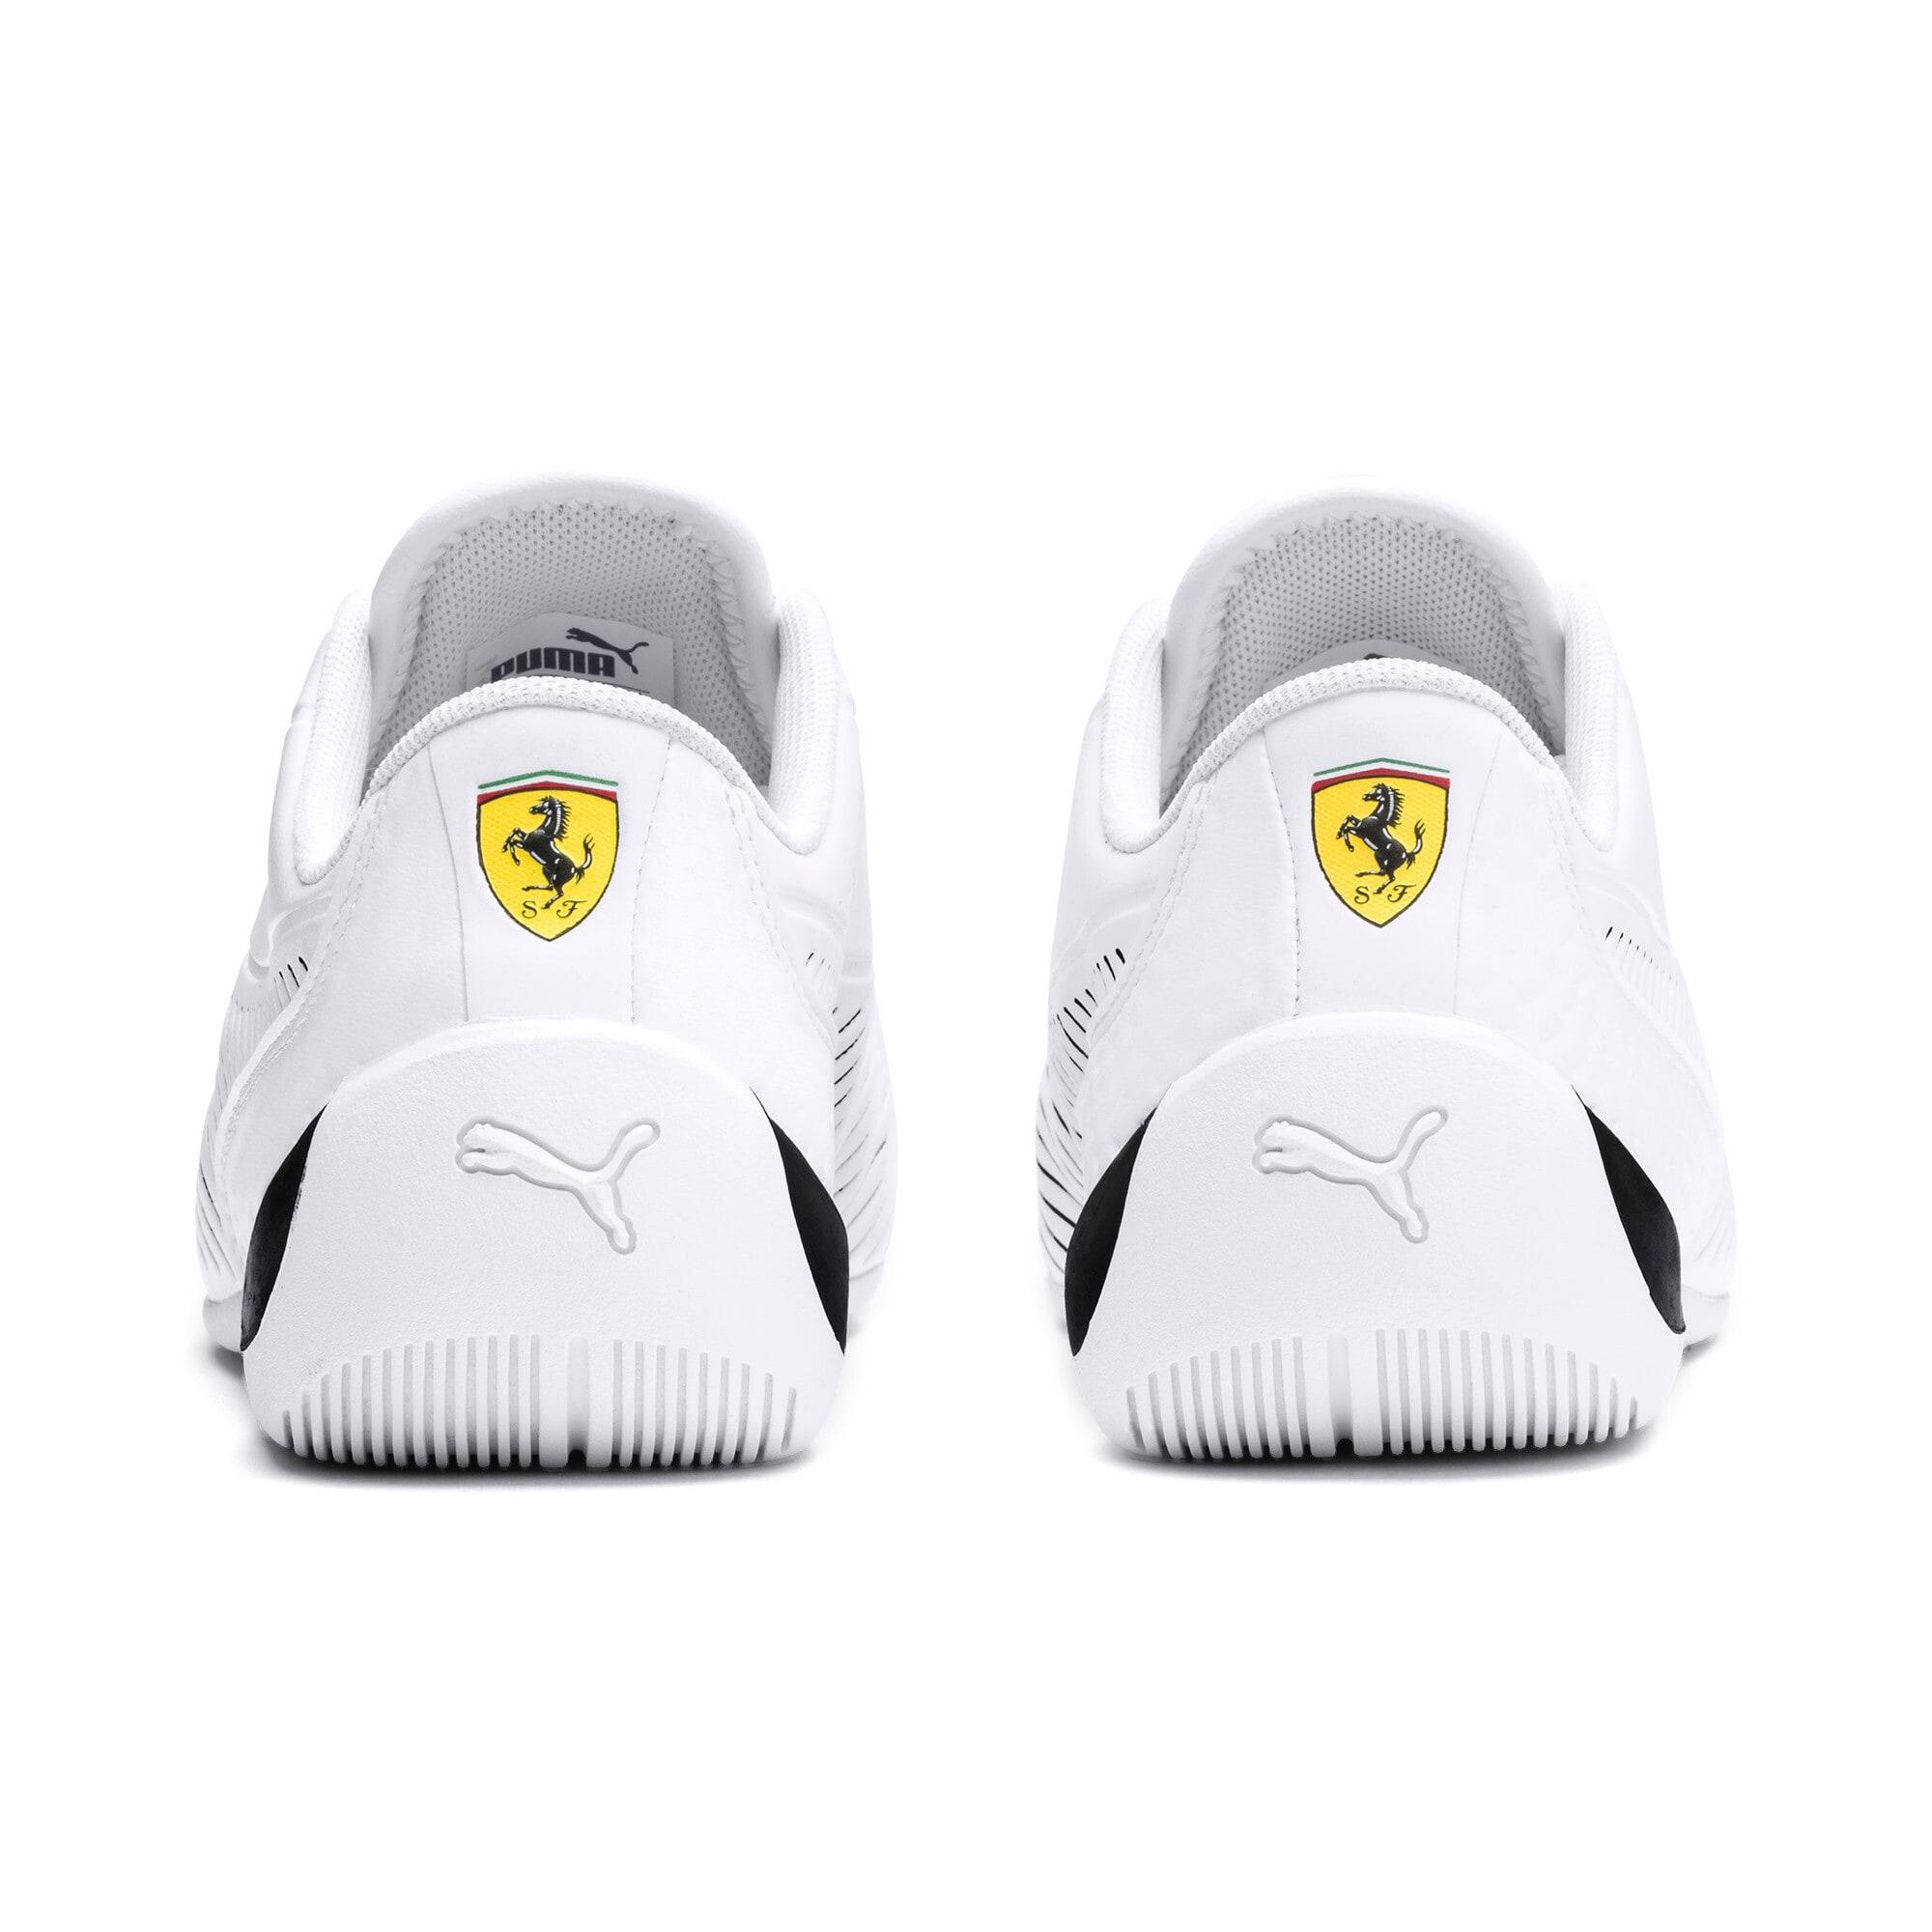 Thumbnail 3 of Ferrari Drift Cat 7S Ultra Youth Sneaker, Puma White-Puma Black, medium